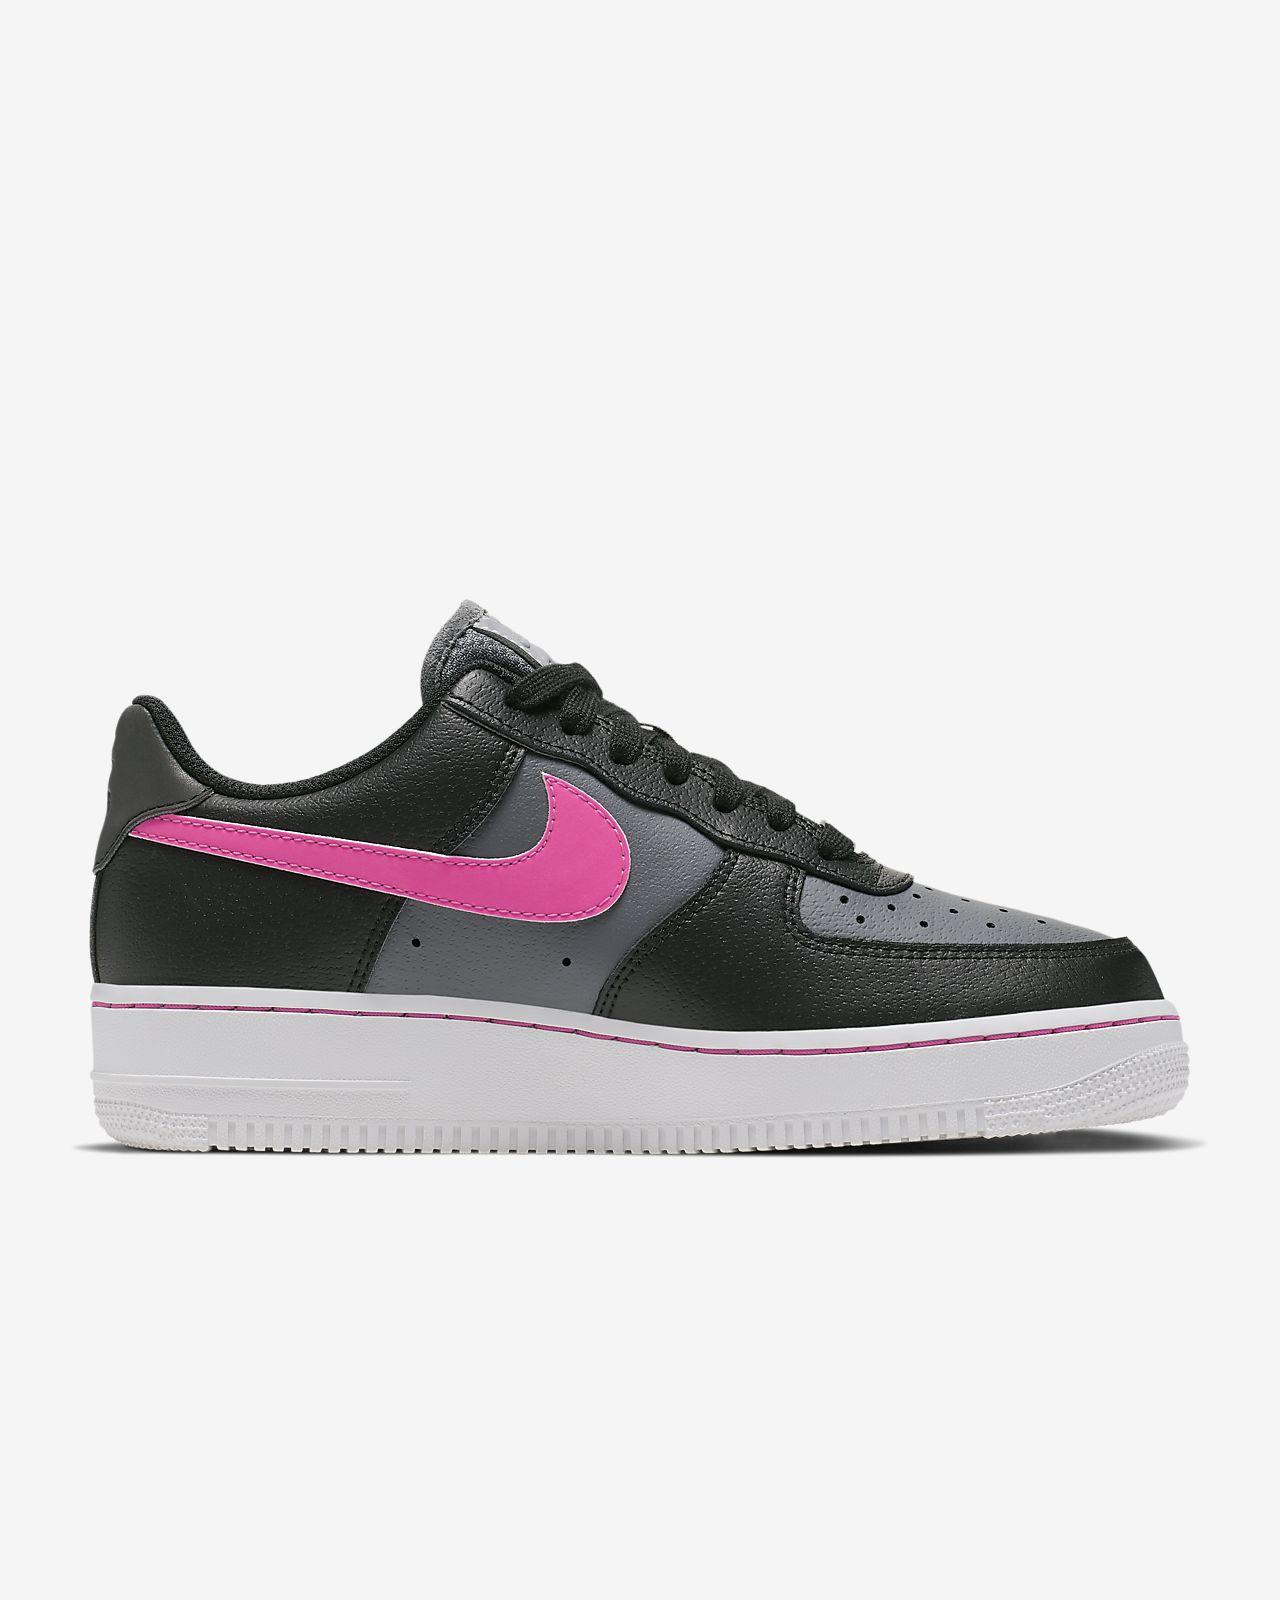 Force Zapatillas Mujer Nike 1 Air Low 4ARq35LScj